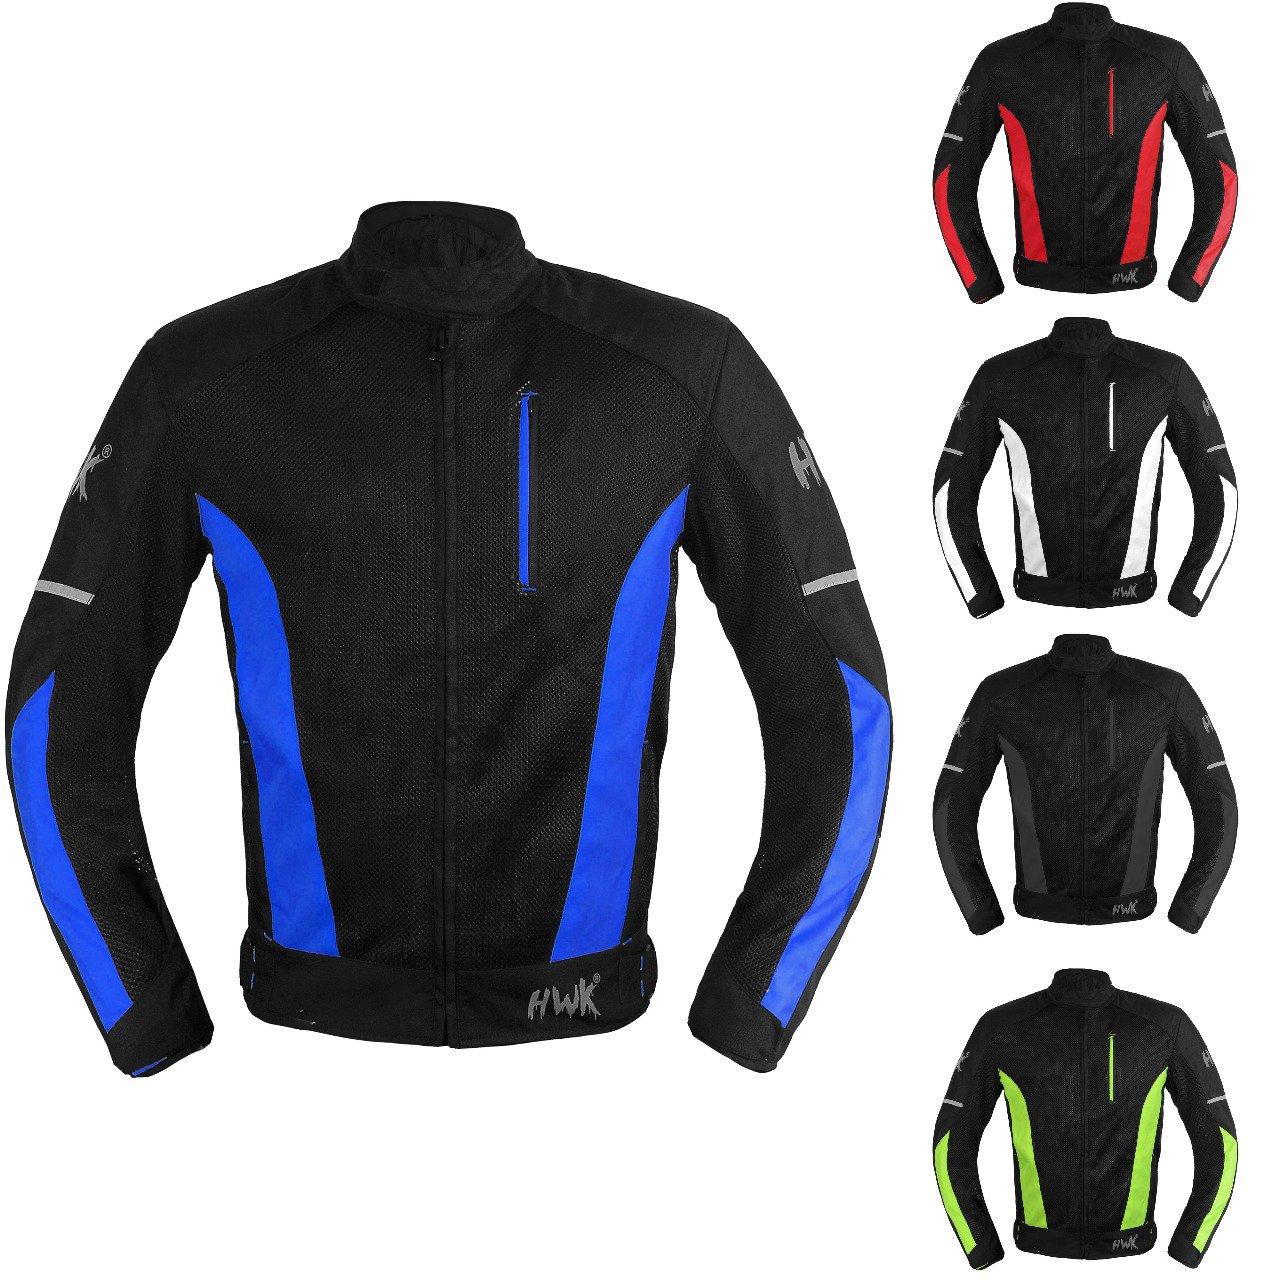 Mesh Motorcycle Jacket Textile Motorbike Summer Biker Air Jacket CE ARMOURED BREATHABLE (XXX-Large, Blue)